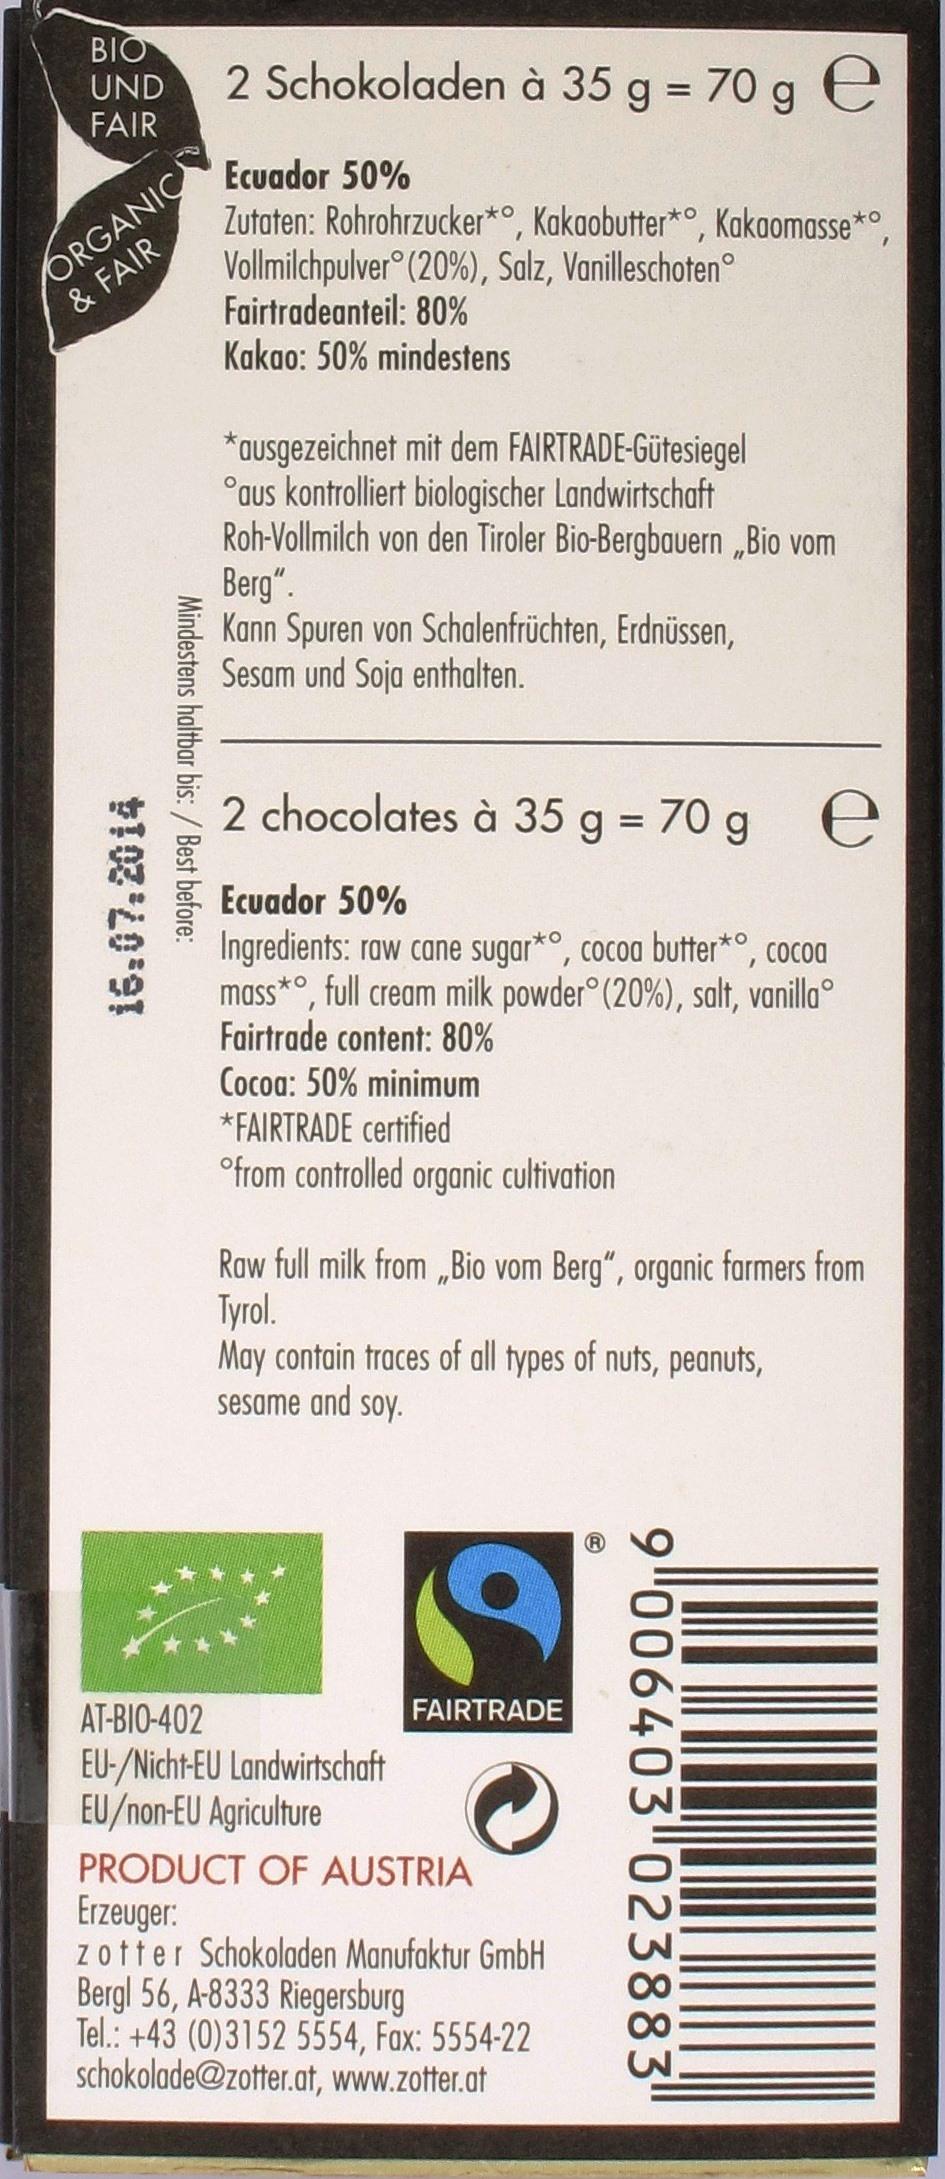 Zotter Labooko Ecuador 50% Milchschokolade, Rückseite